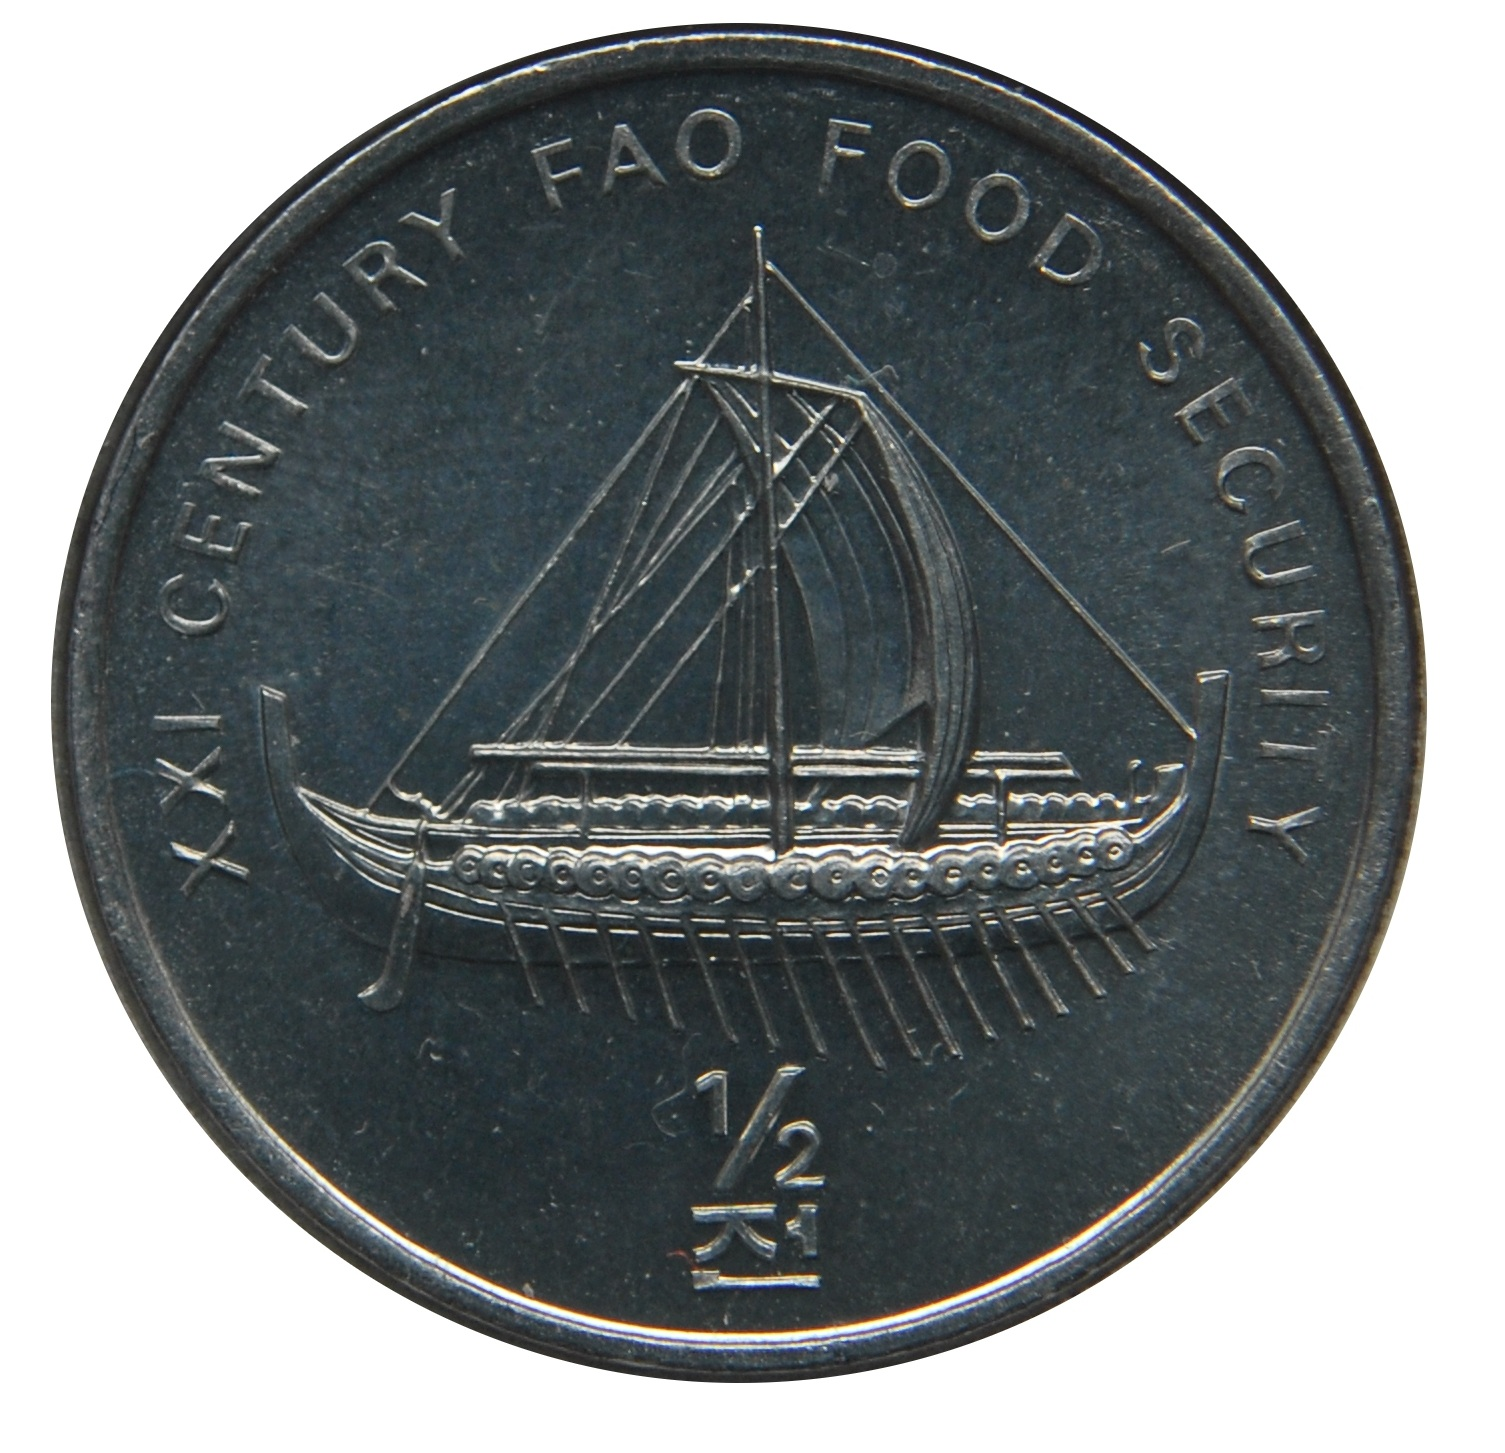 KOREA REP 1//2 CHON 2002 UNC ARCHAIC SHIP,F.A.O,STATE ARMS